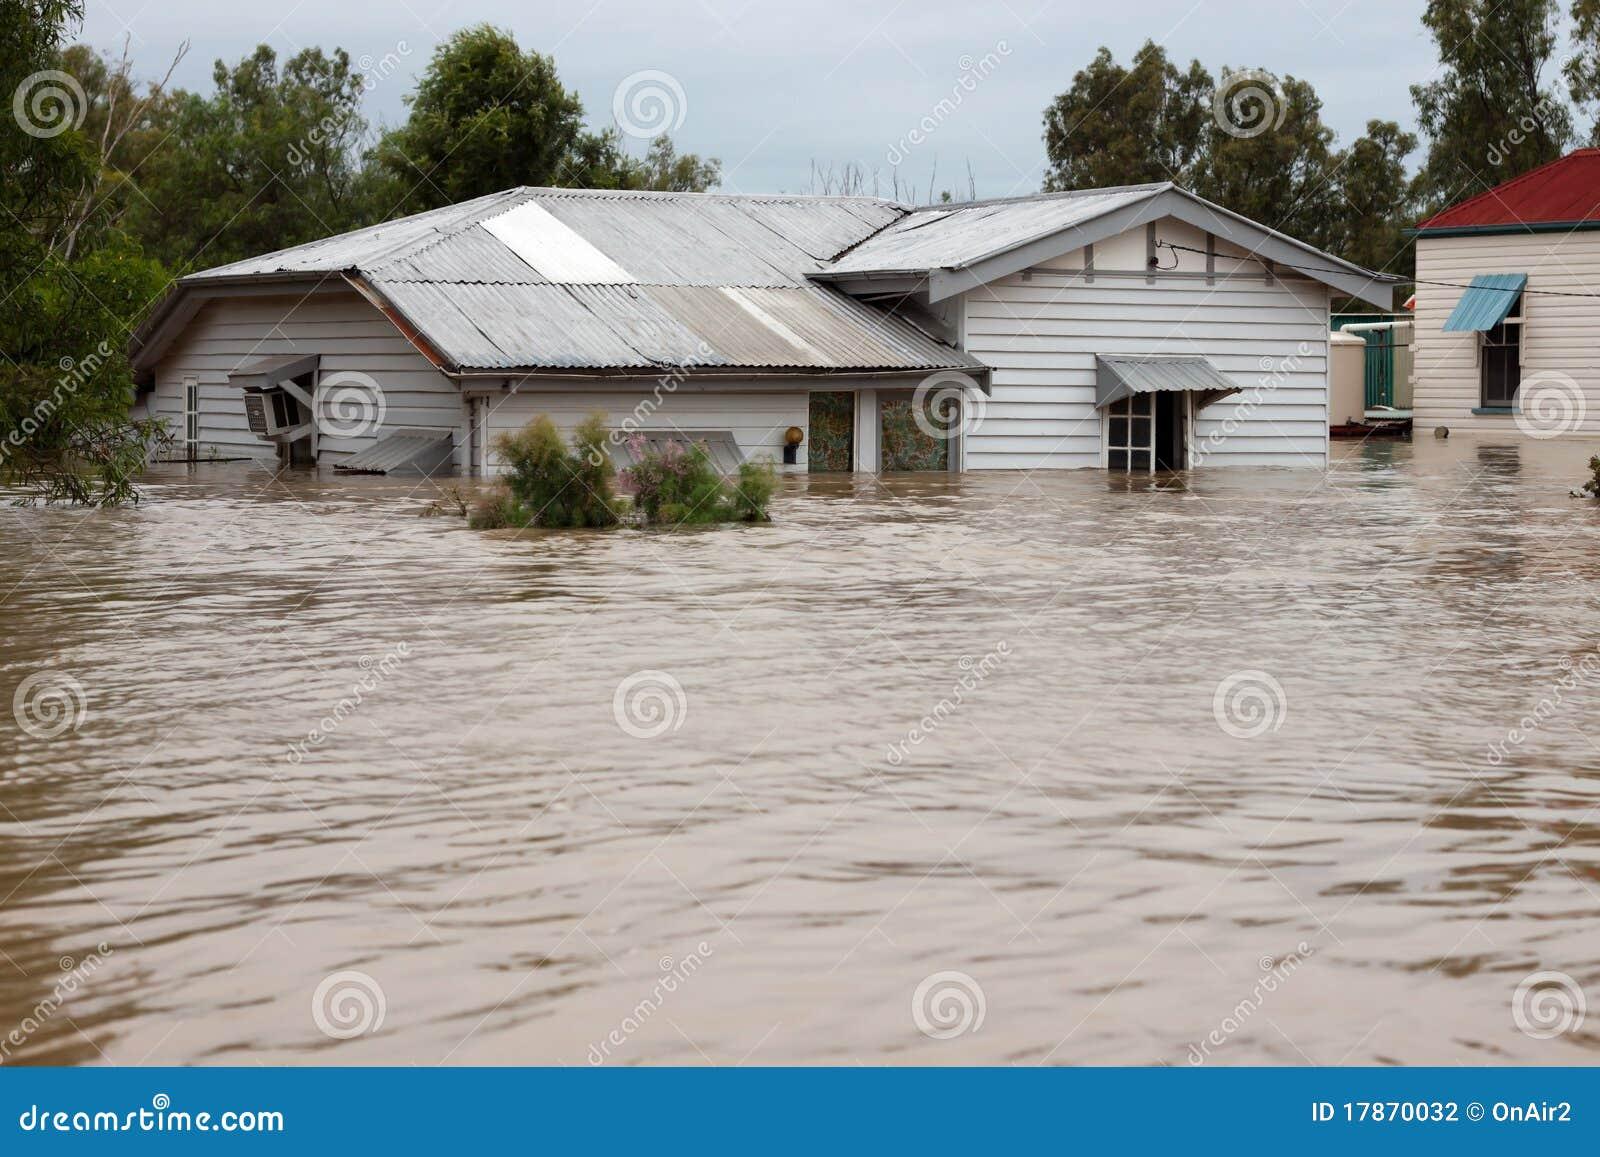 Chambre d 39 assurance contre l 39 inondation photo stock - Contre l humidite maison ...